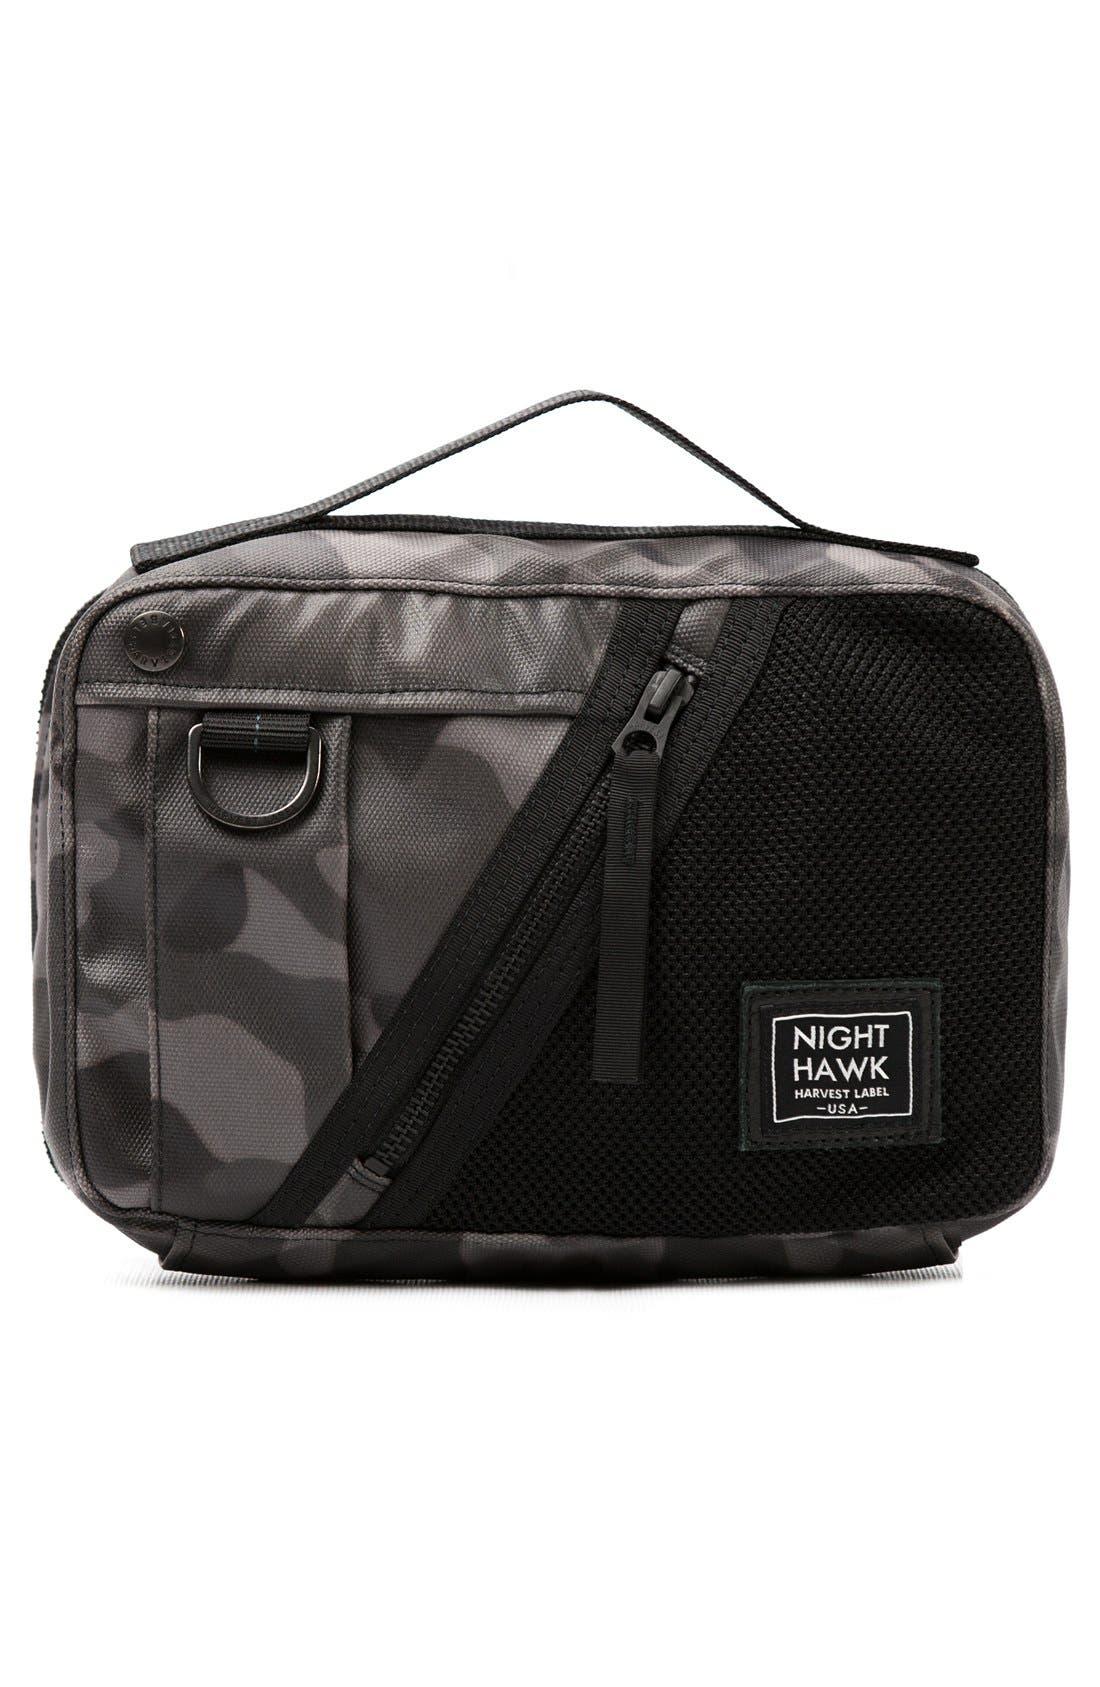 Harvest Label 'NightHawk' Travel Kit